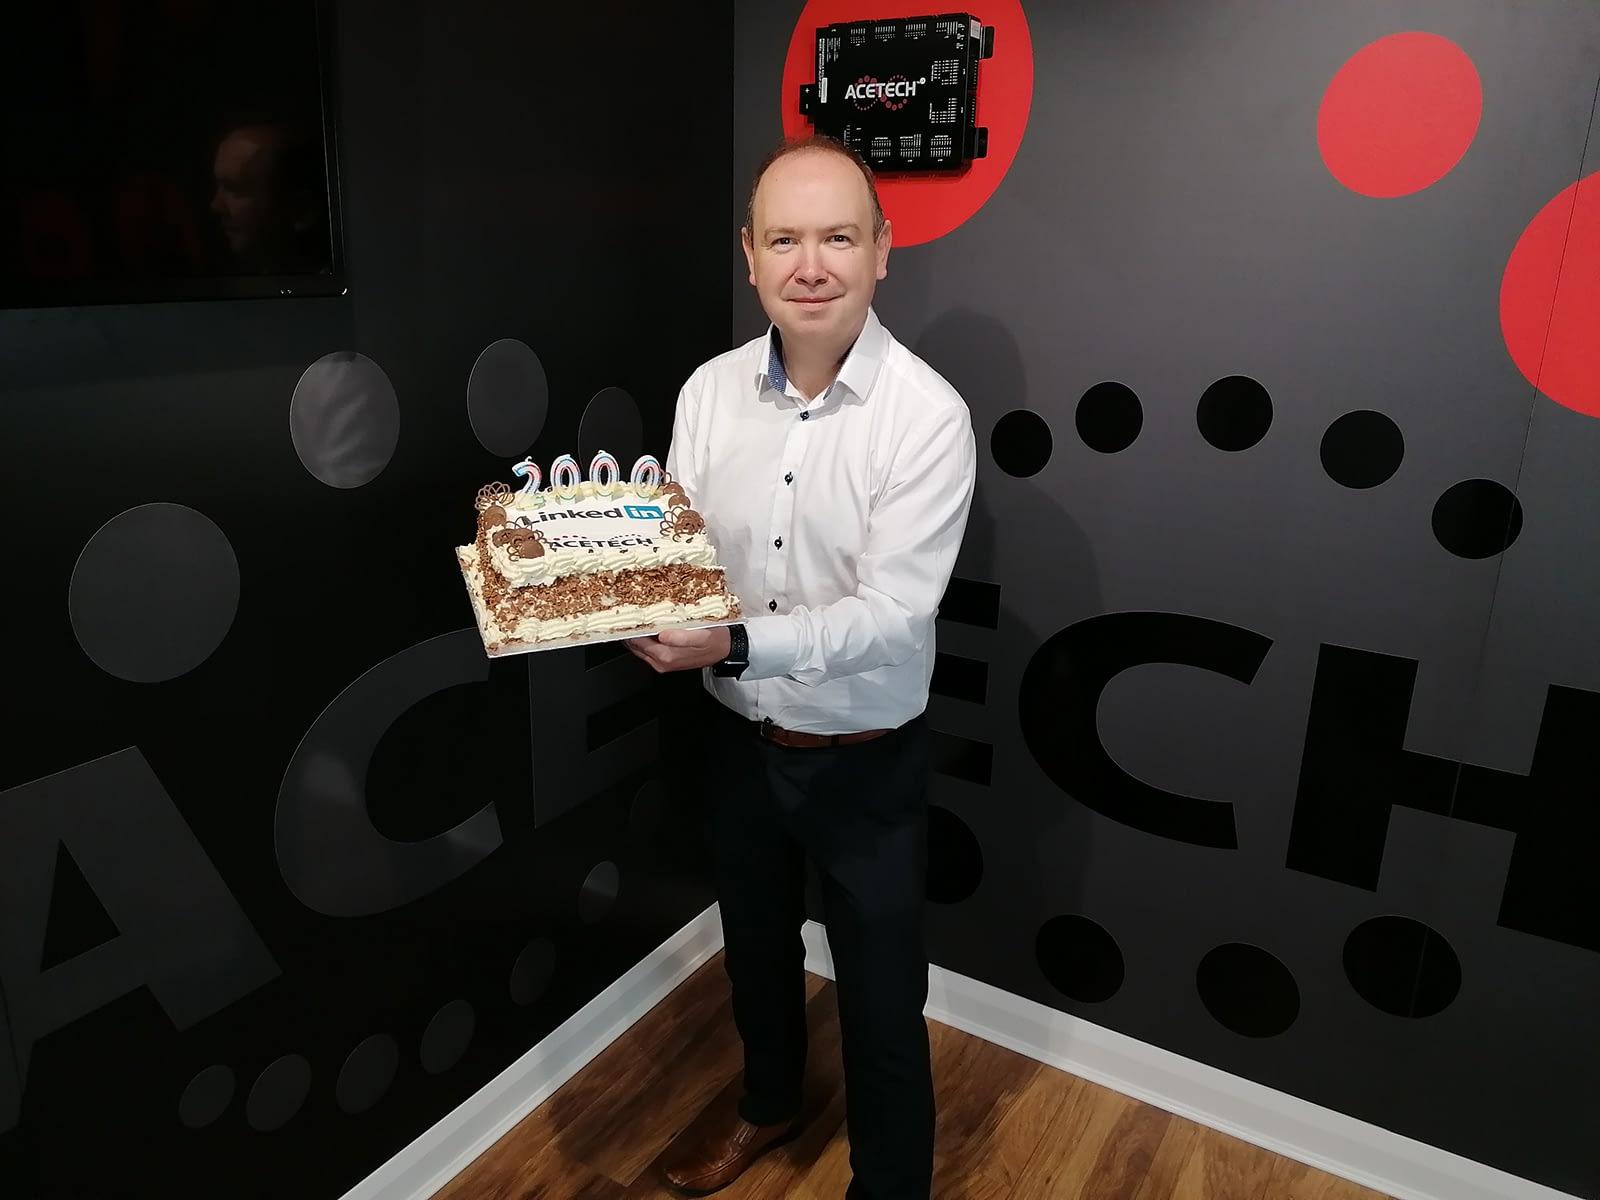 ACETECH Celebrates LinkedIn Milestone!